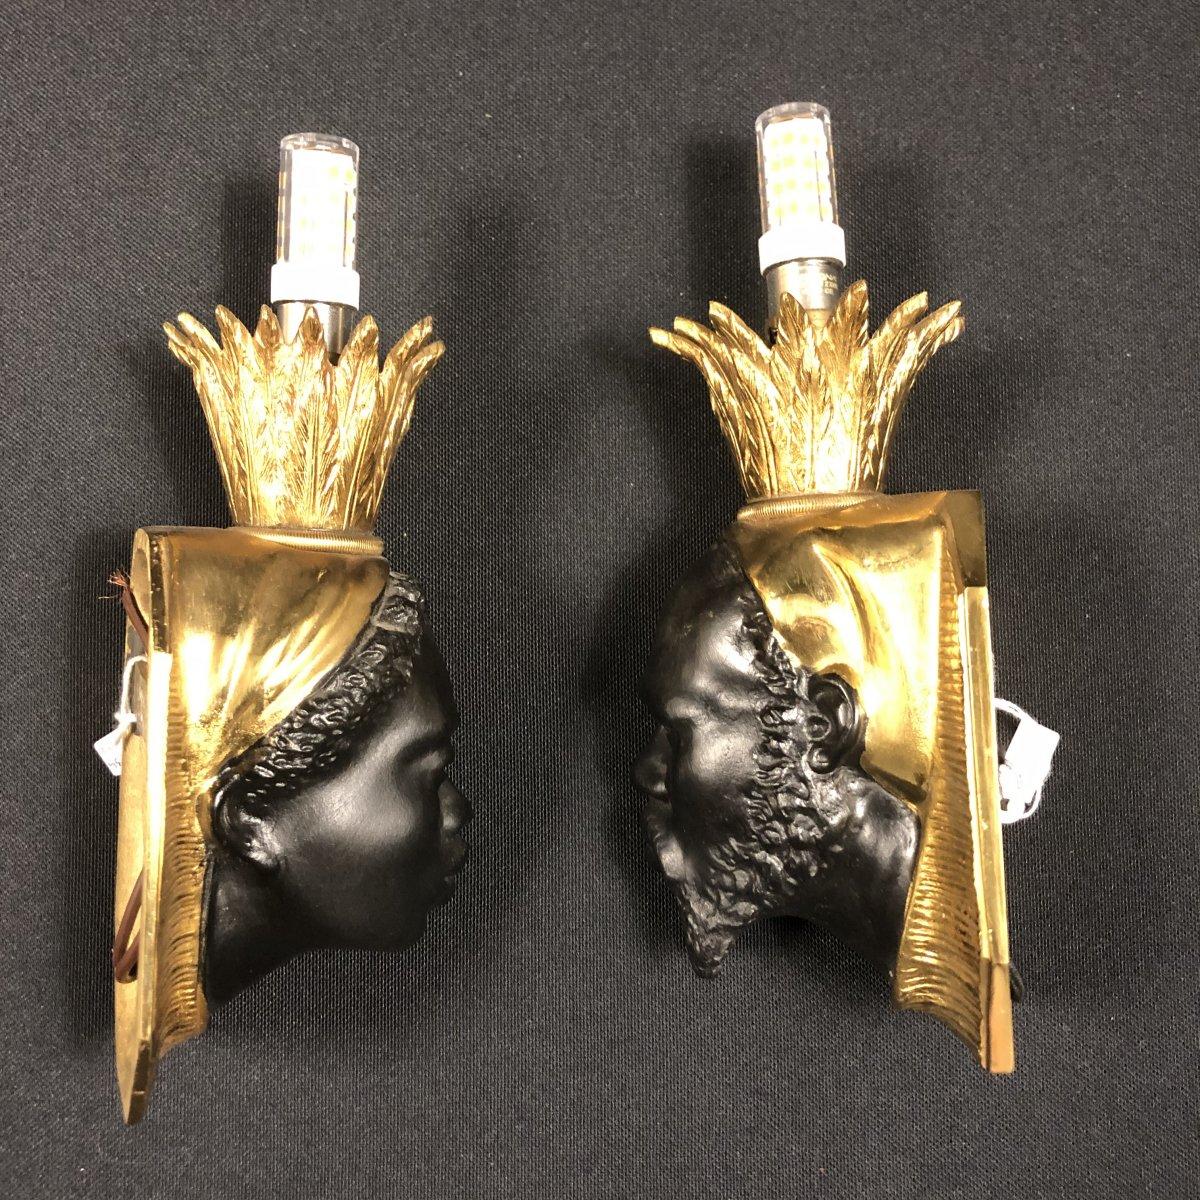 Pair Of Nubian Sconces, Original Model Attributed To Baguès-photo-1